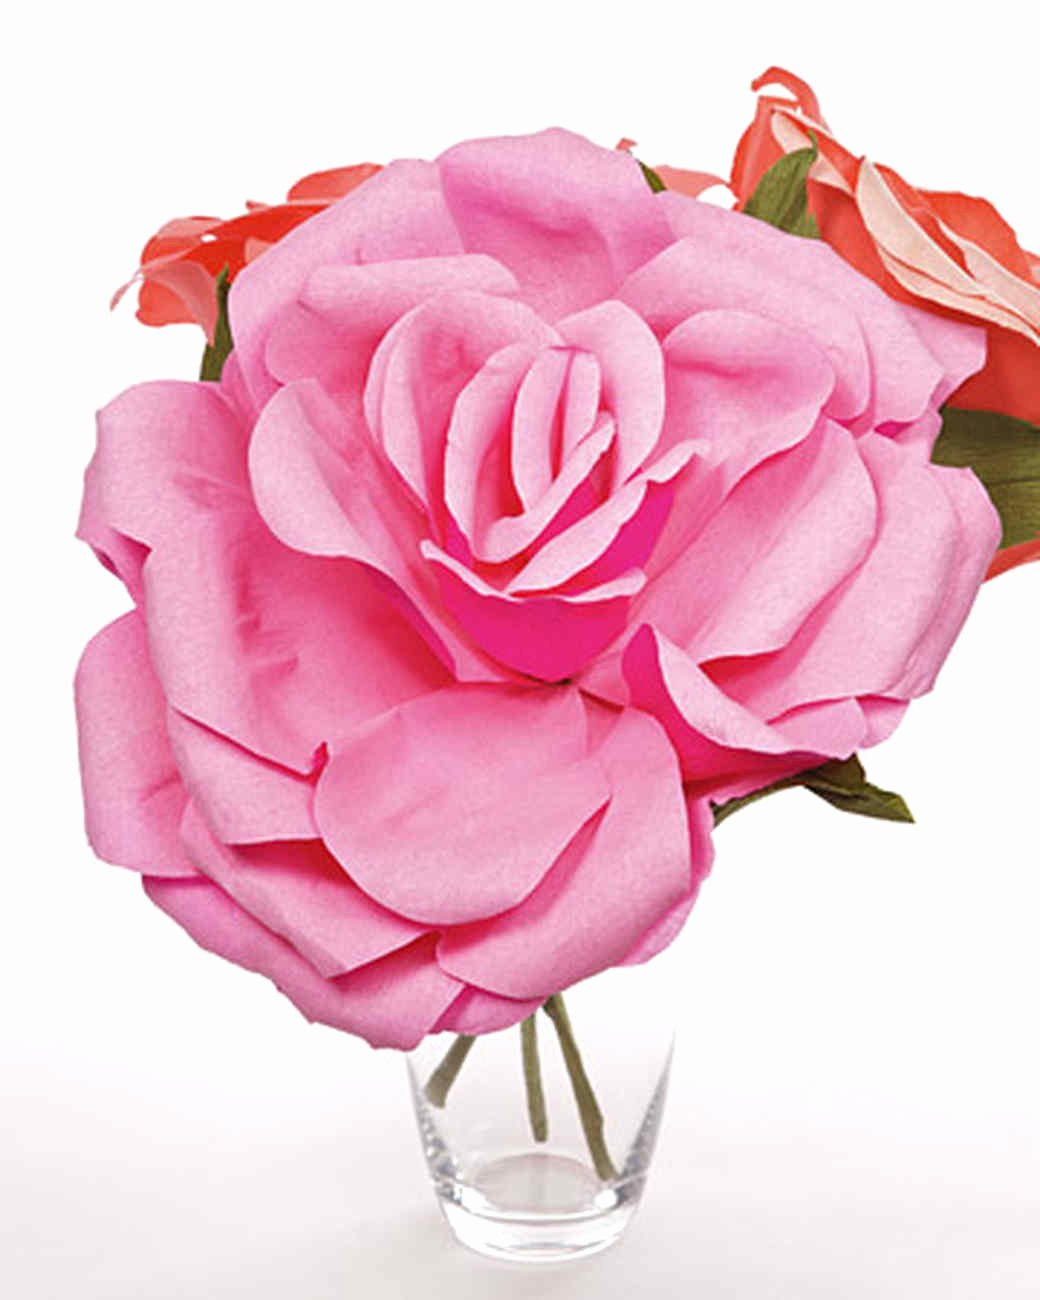 Large Rose Paper Flower Template Elegant Crepe Paper Roses & Video